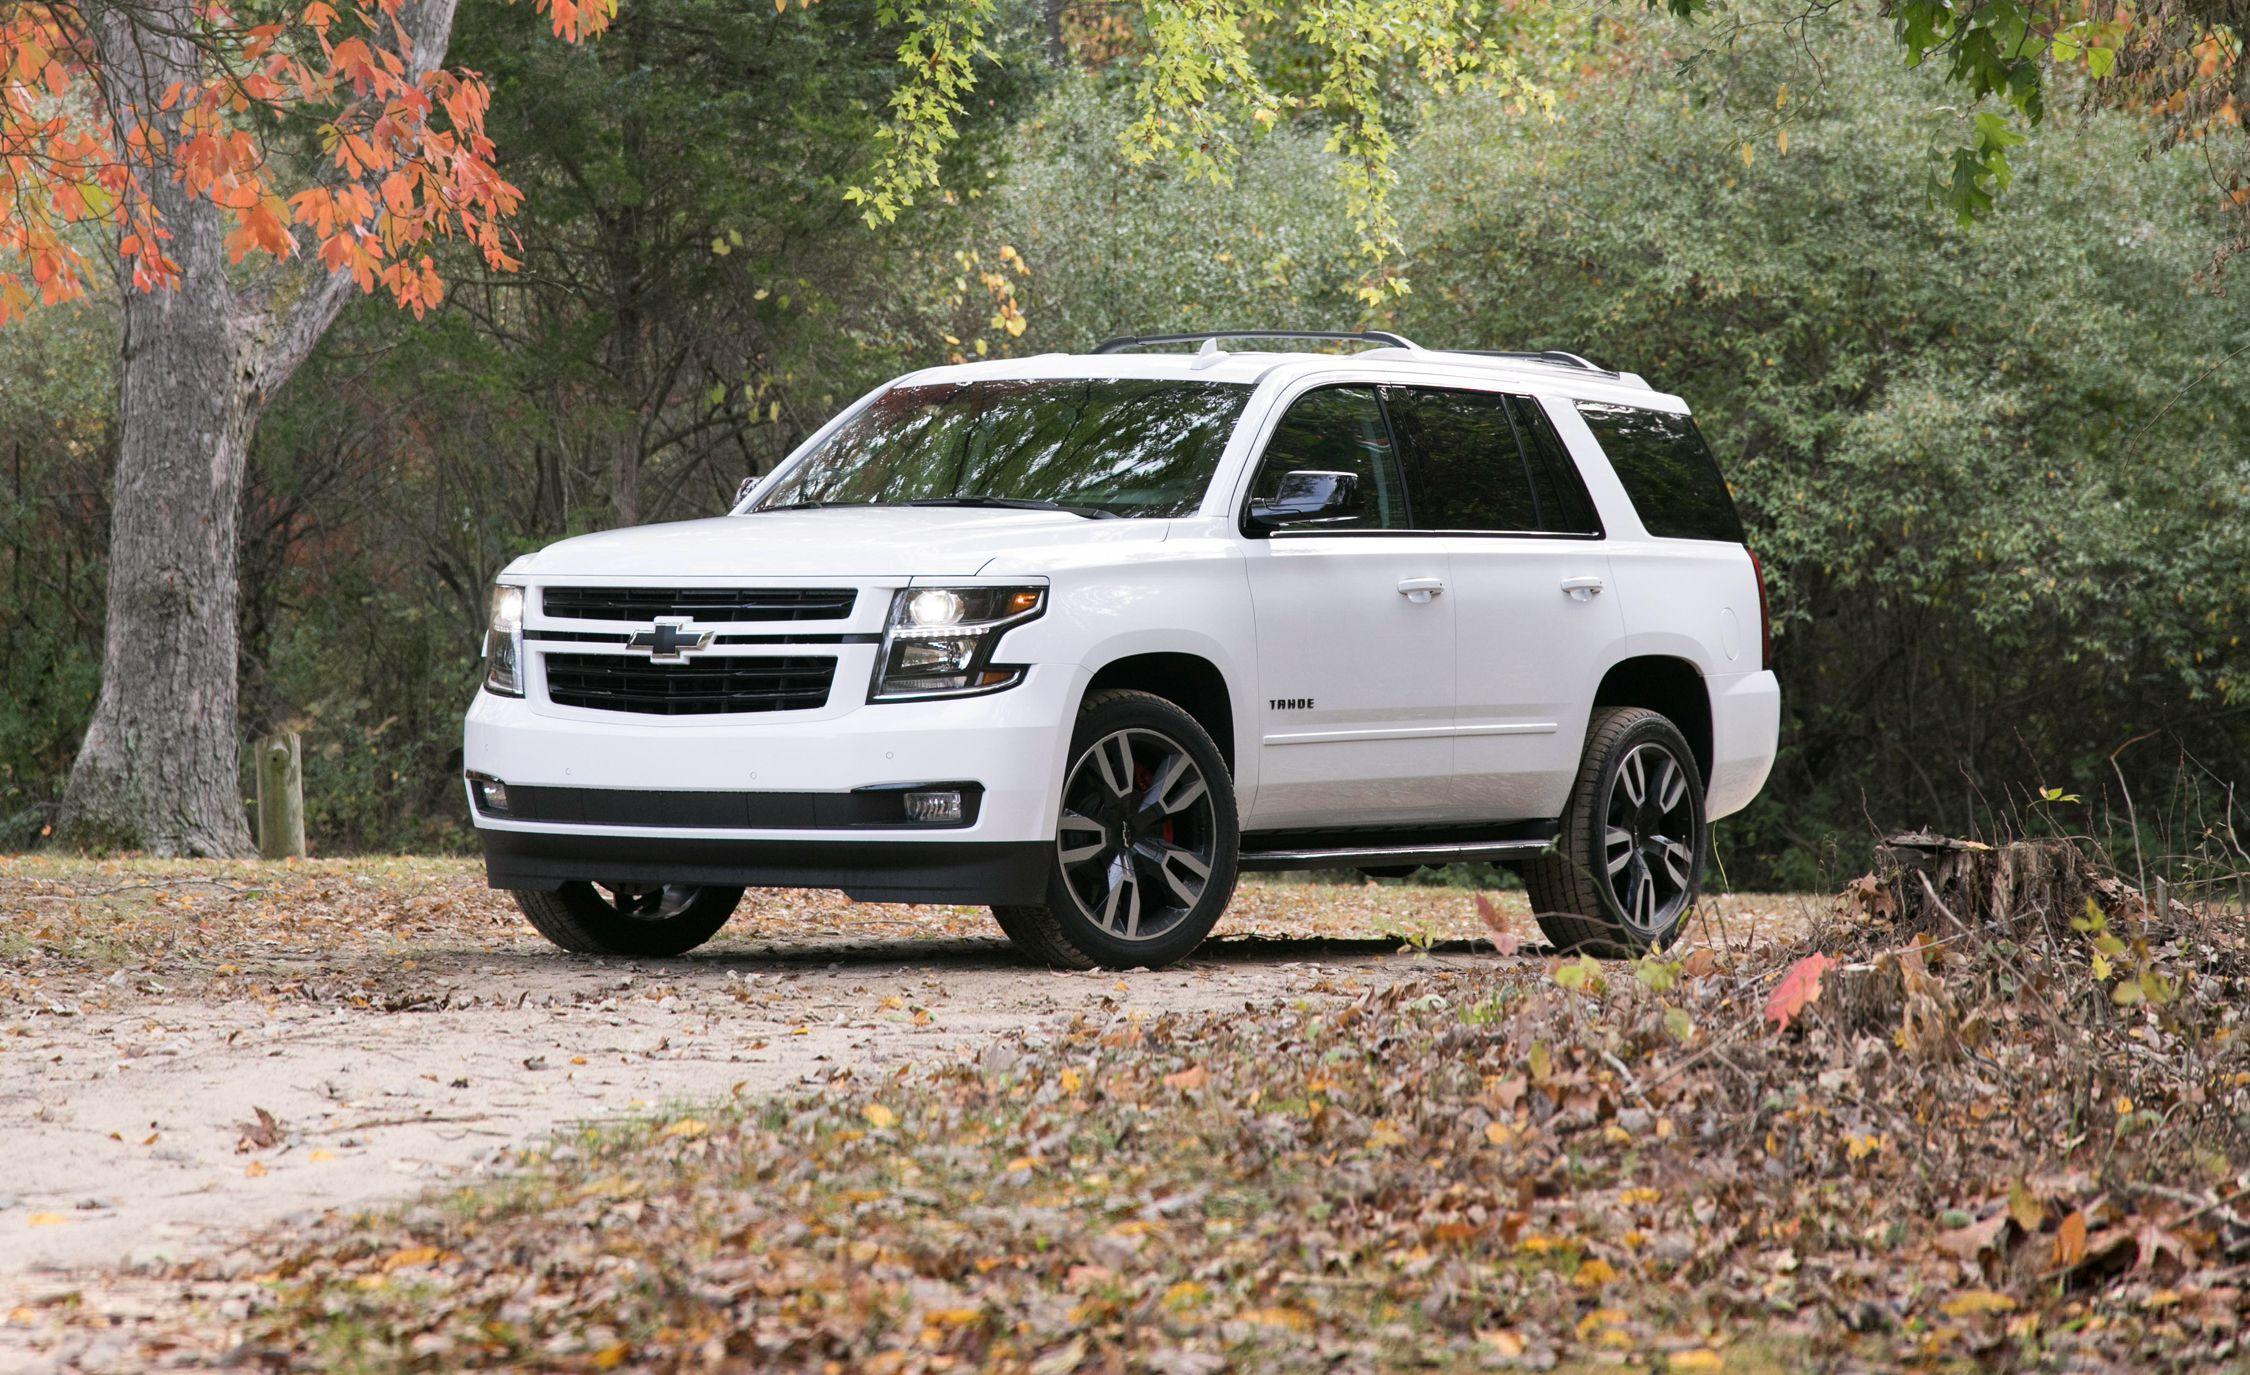 Chevrolet Tahoe Reviews | Chevrolet Tahoe Price, Photos ...